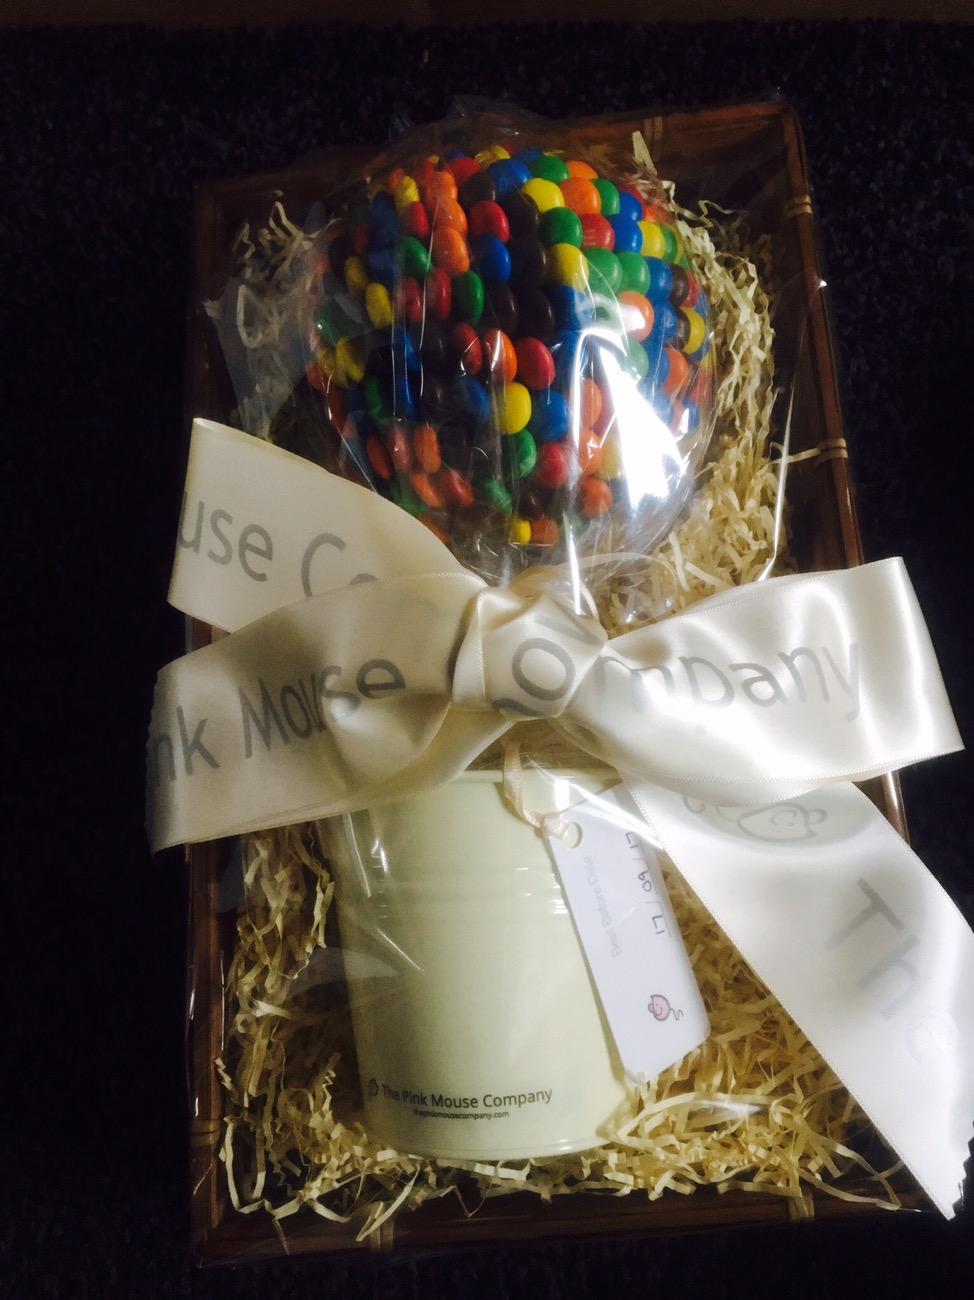 m & ms gift ideas